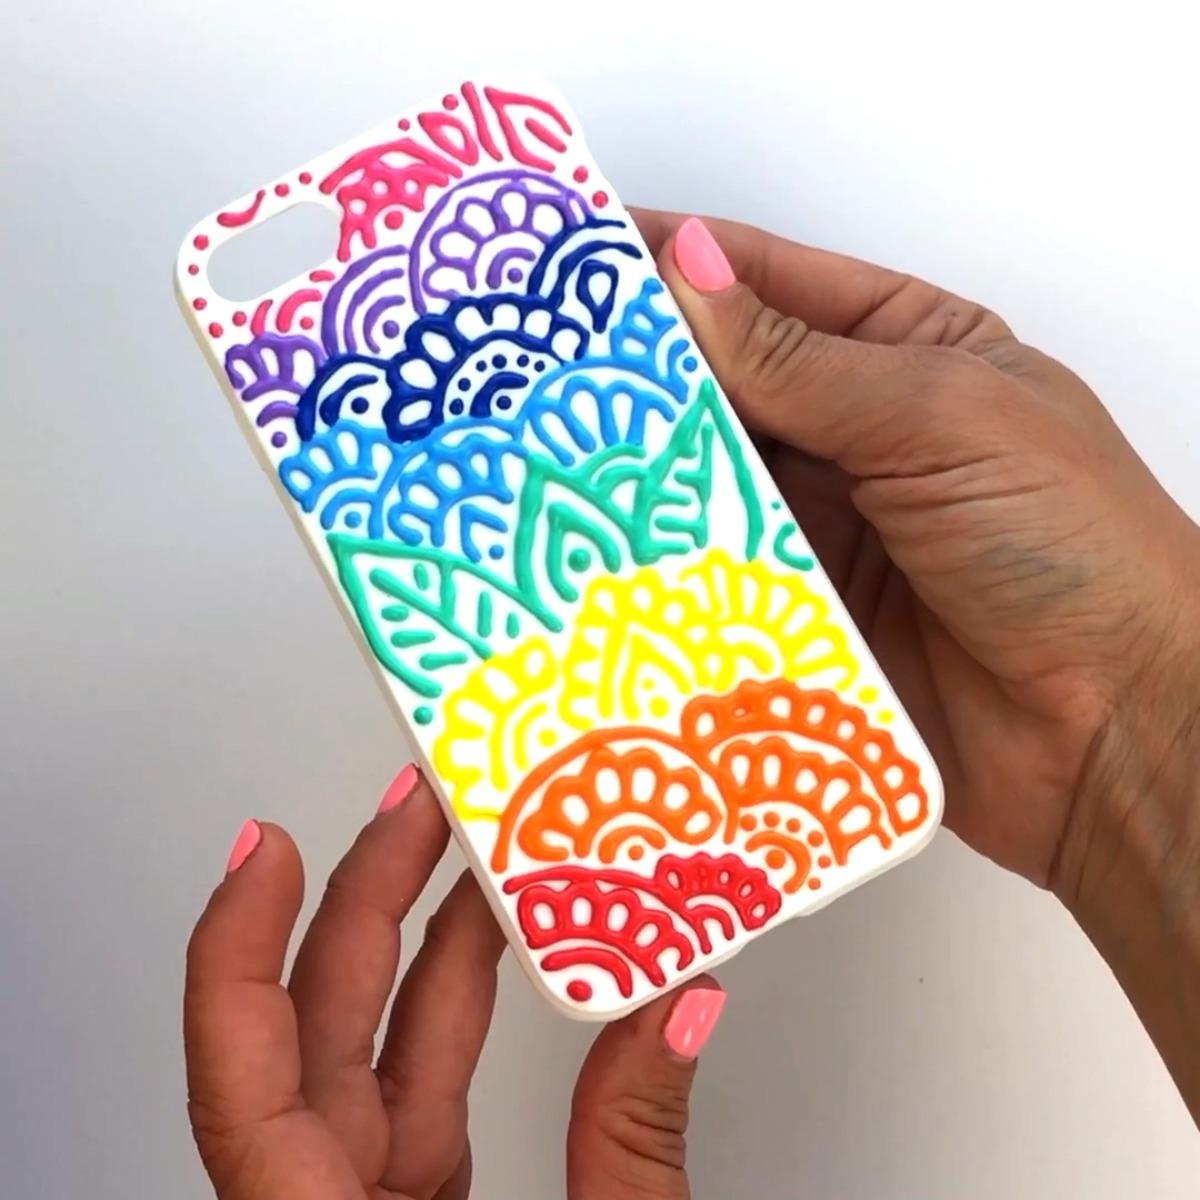 Repeat Mandala designs to fill the case